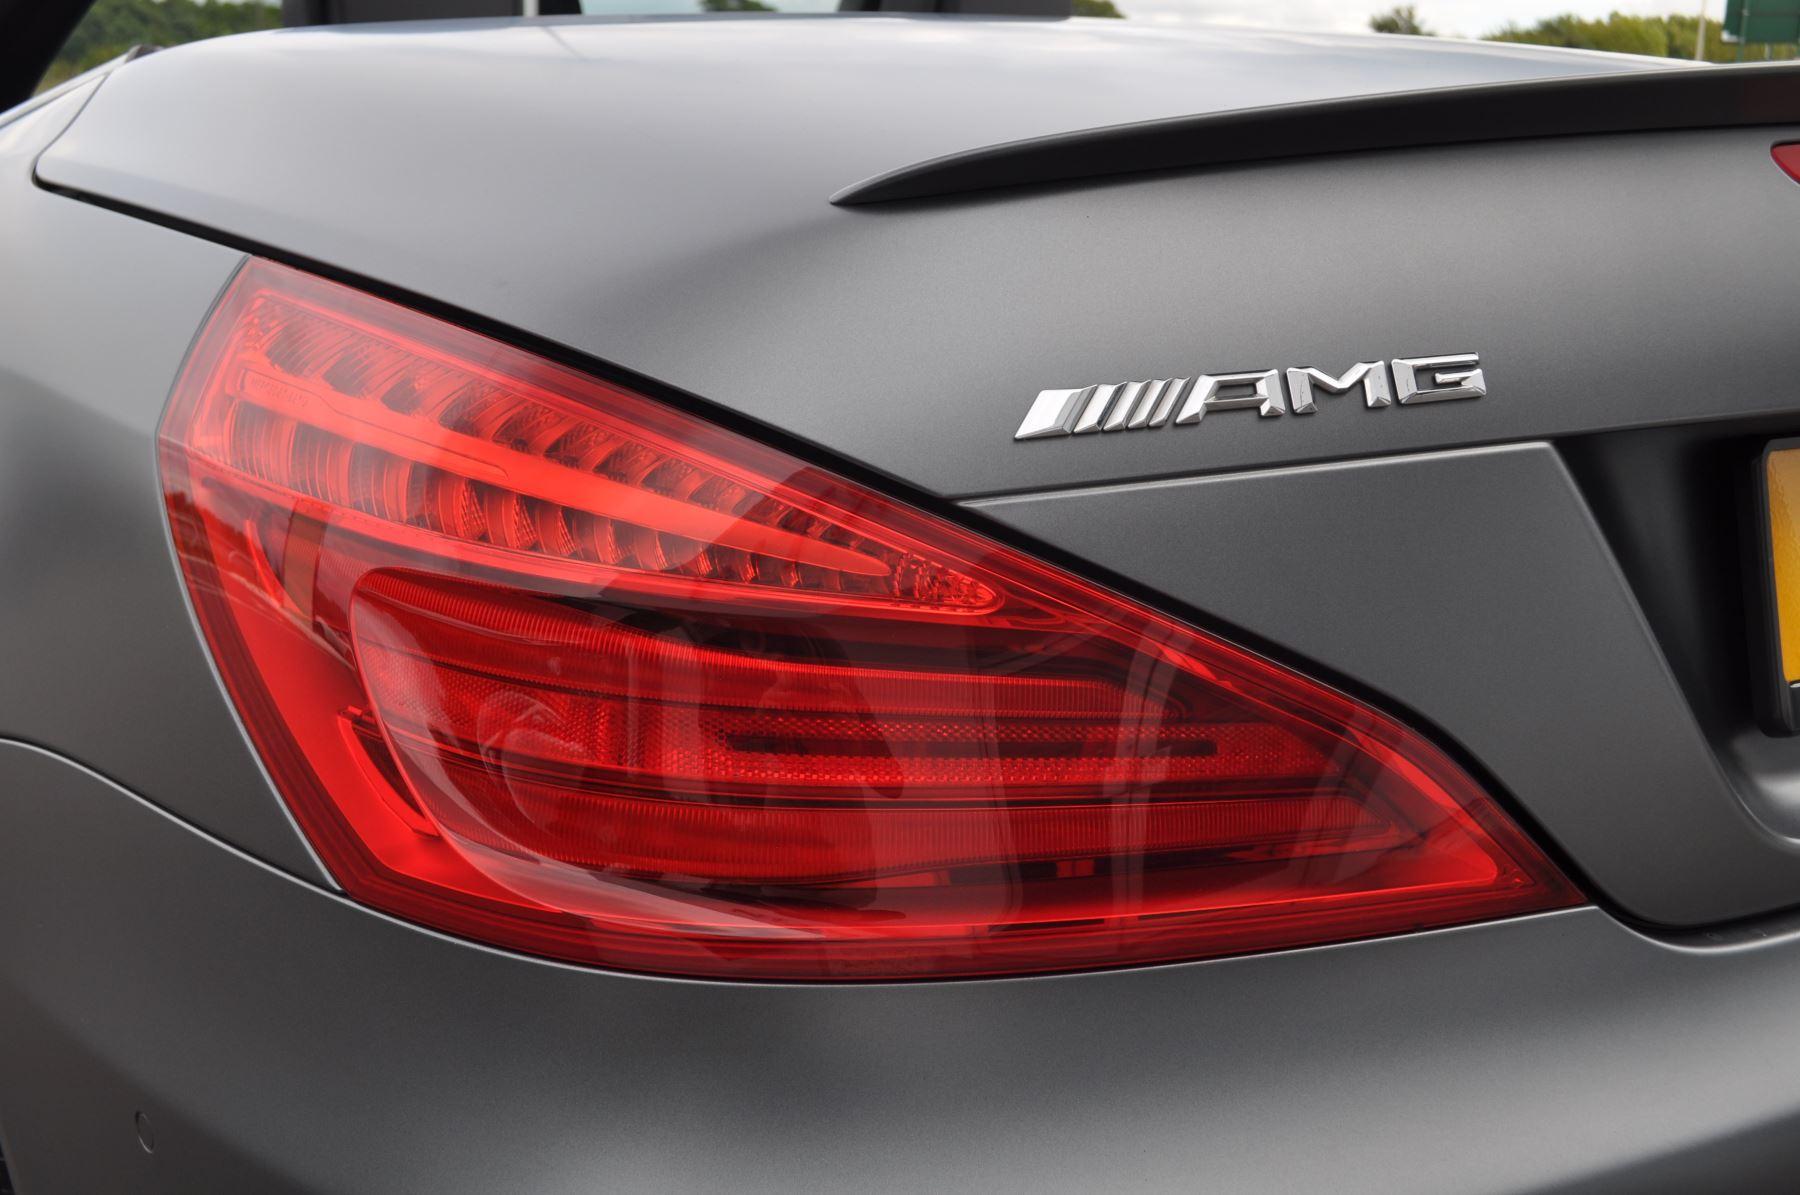 Mercedes Benz SL SL 63 [585] 2dr Tip 5 5 Automatic Convertible 2016